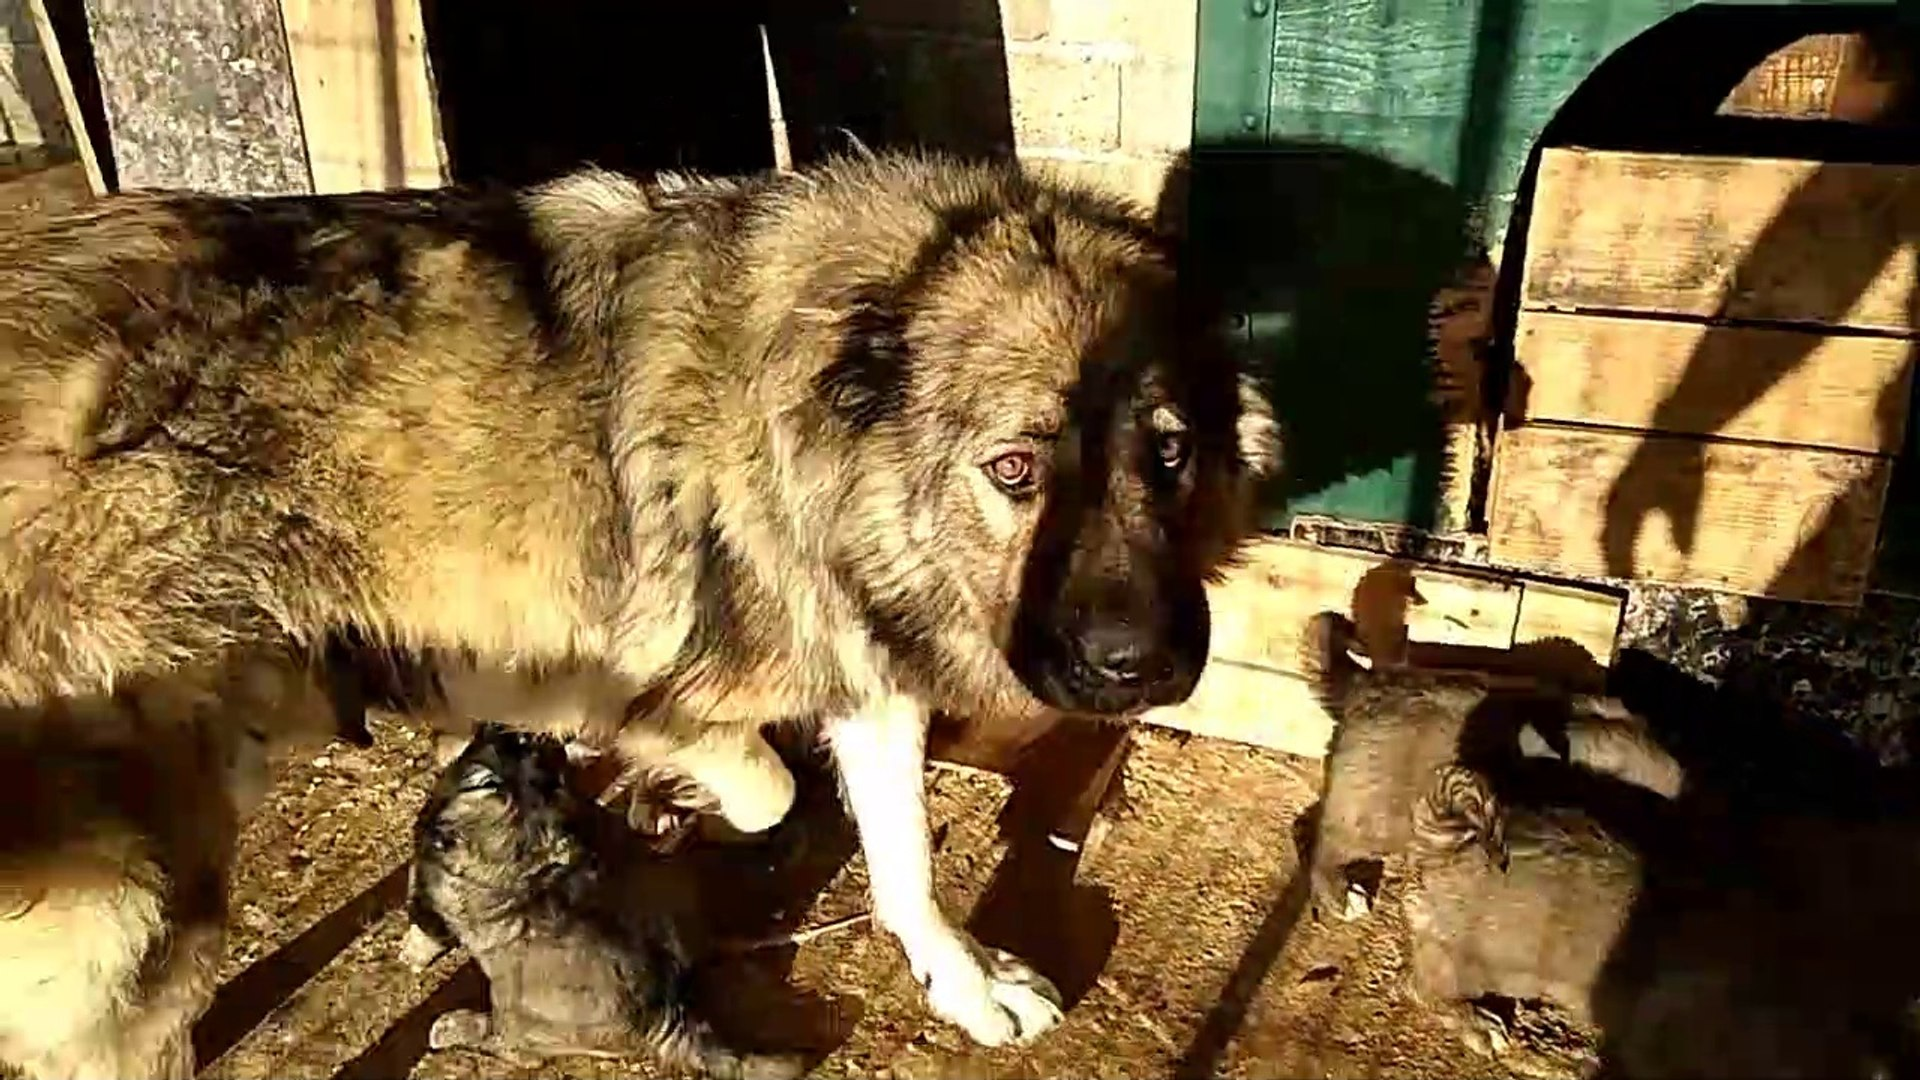 KAFKAS COBAN KOPEGi ve YAVRULARI - CAUCASiAN SHEPHERD DOG and PUPPiES